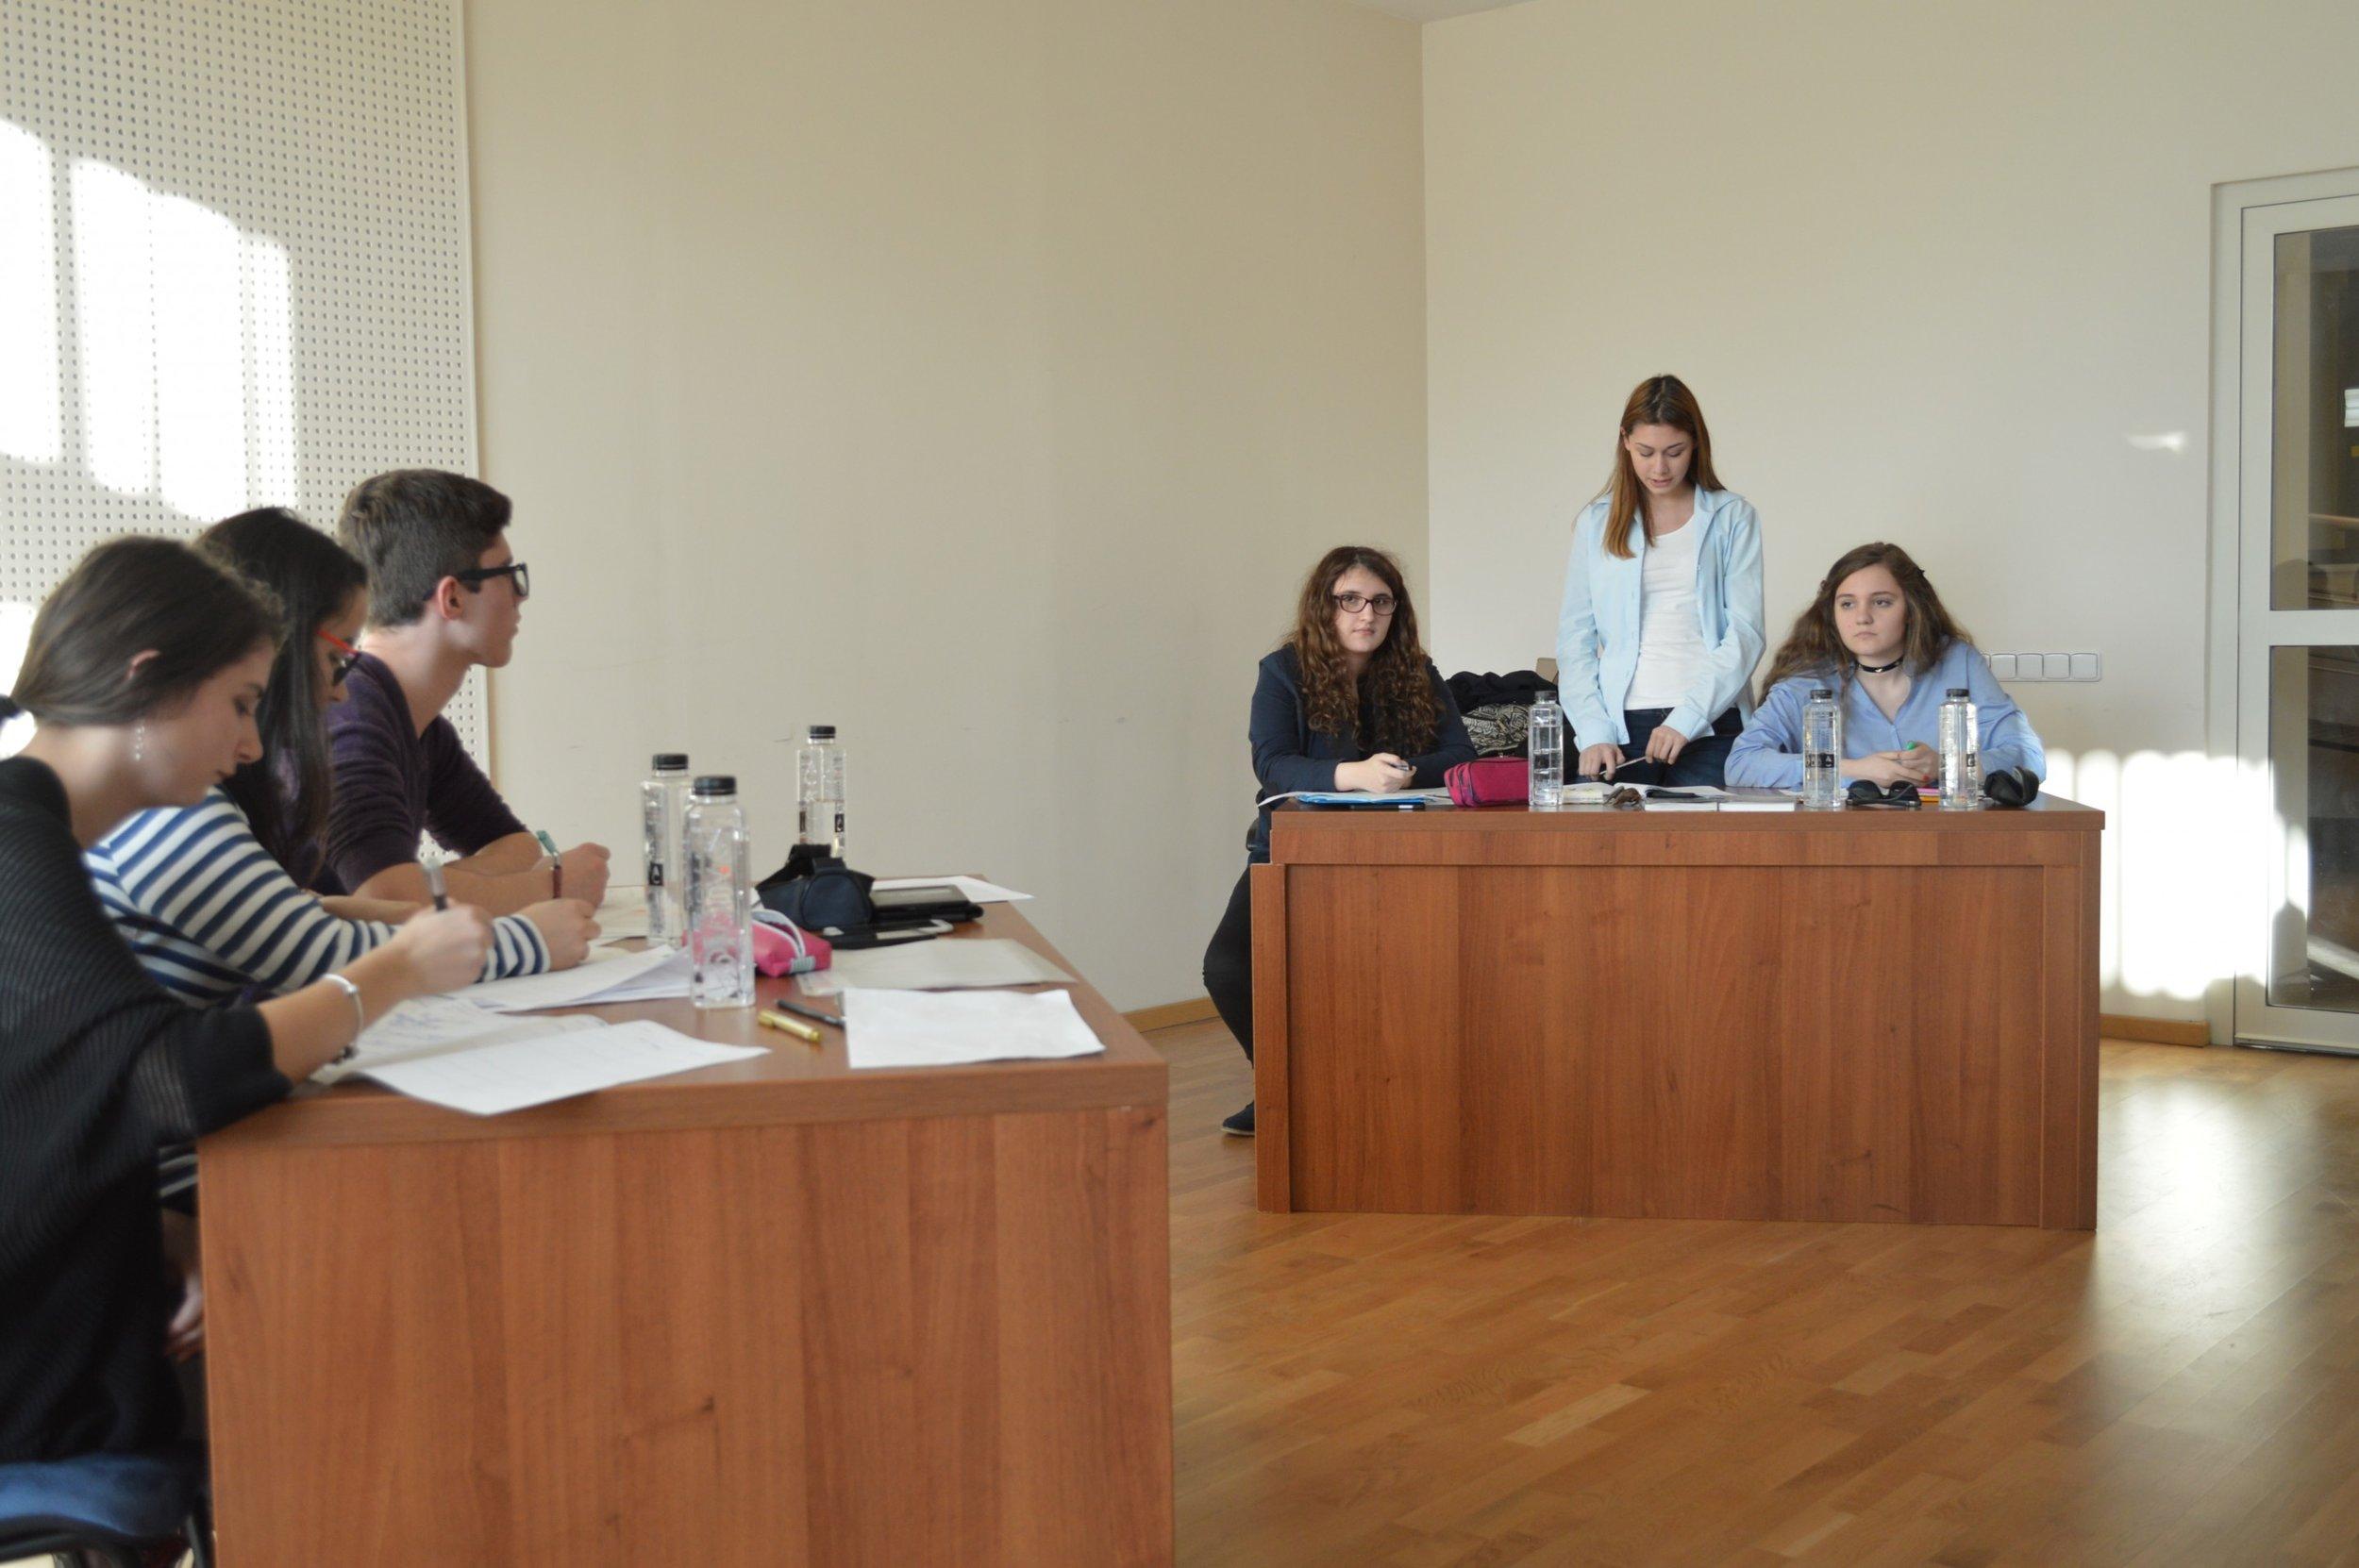 club-debate3-uai-2880x1915.jpg